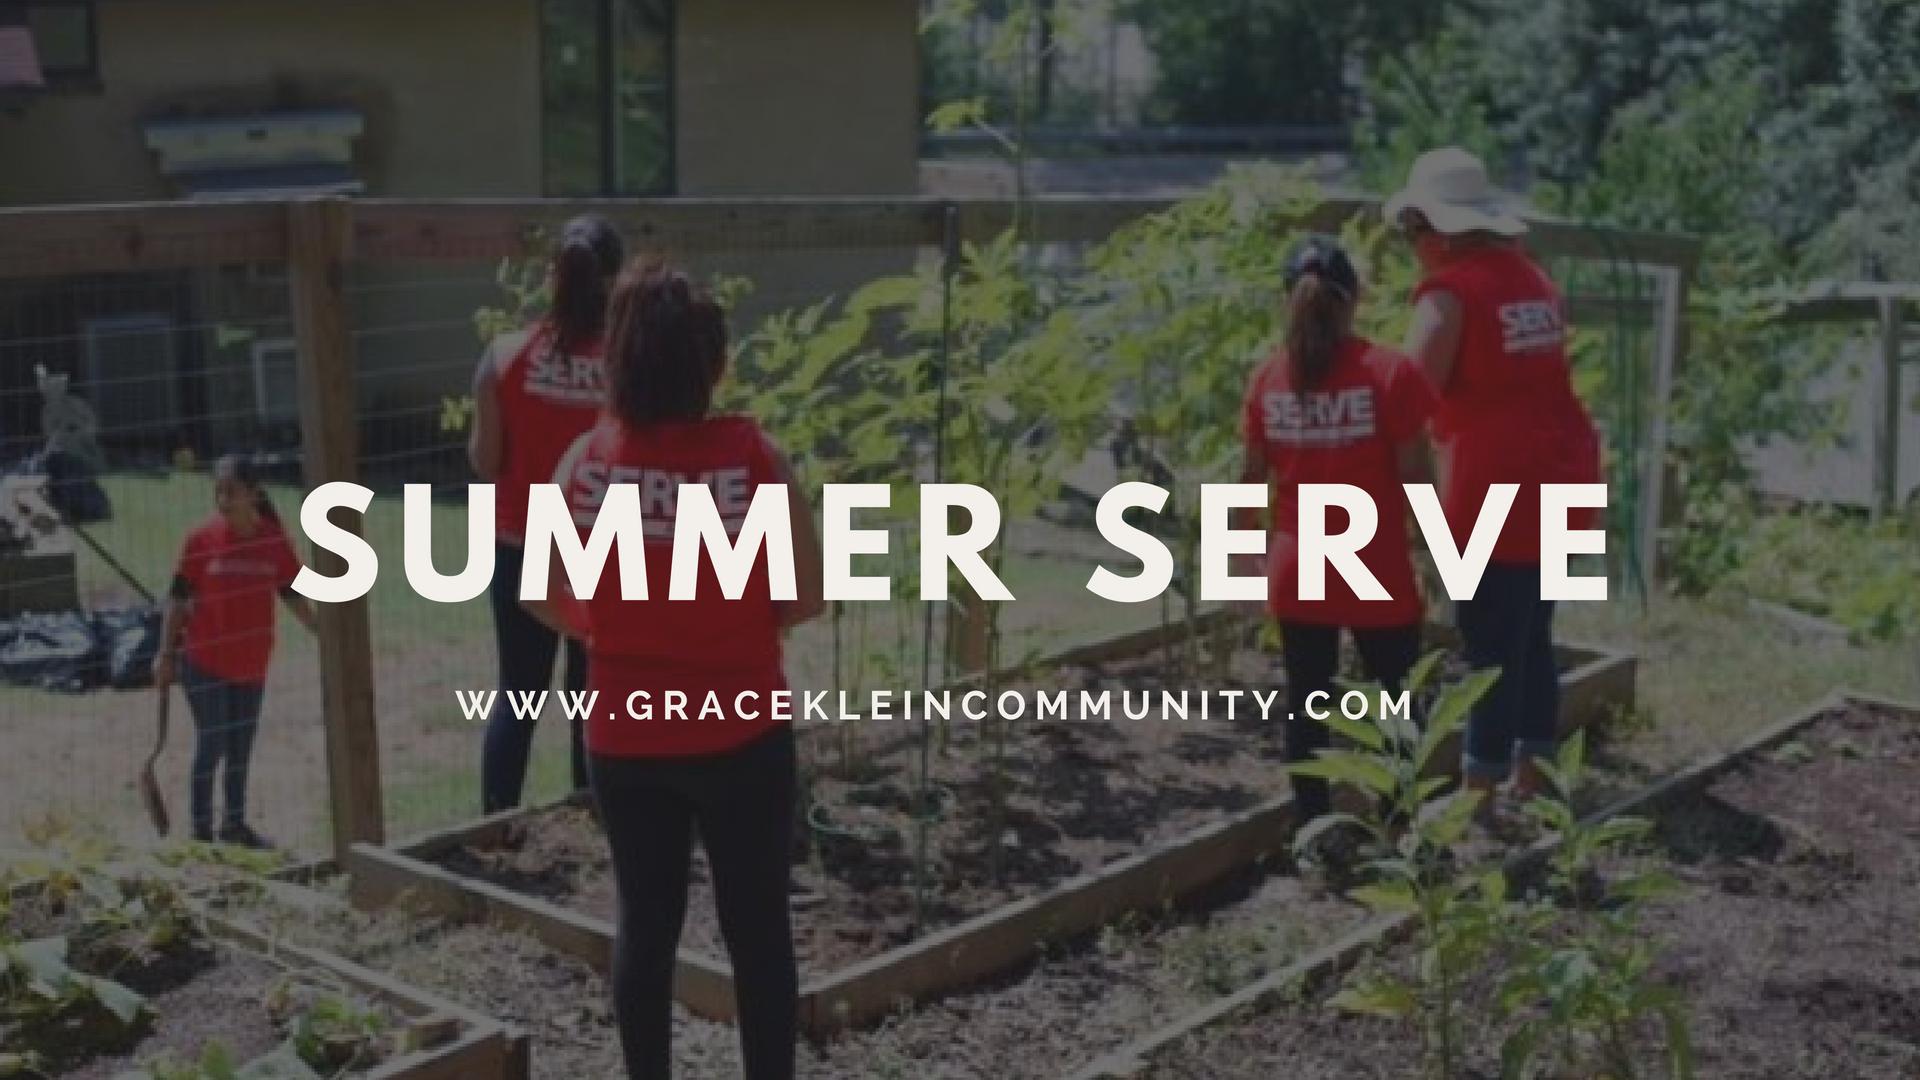 Summer Serve